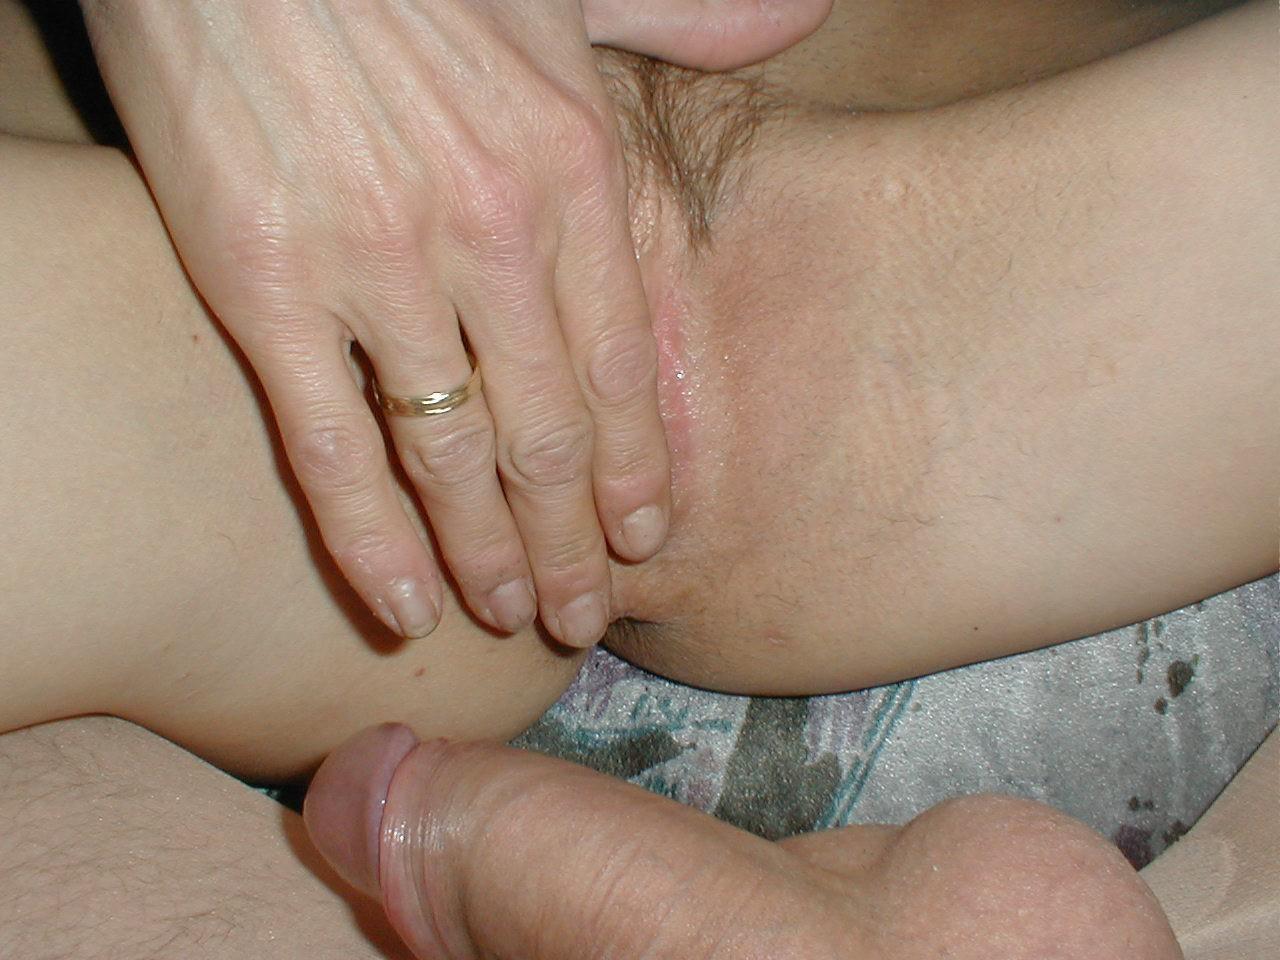 http://pbs-2.adult-empire.com/85/8570/021/pic/5.jpg